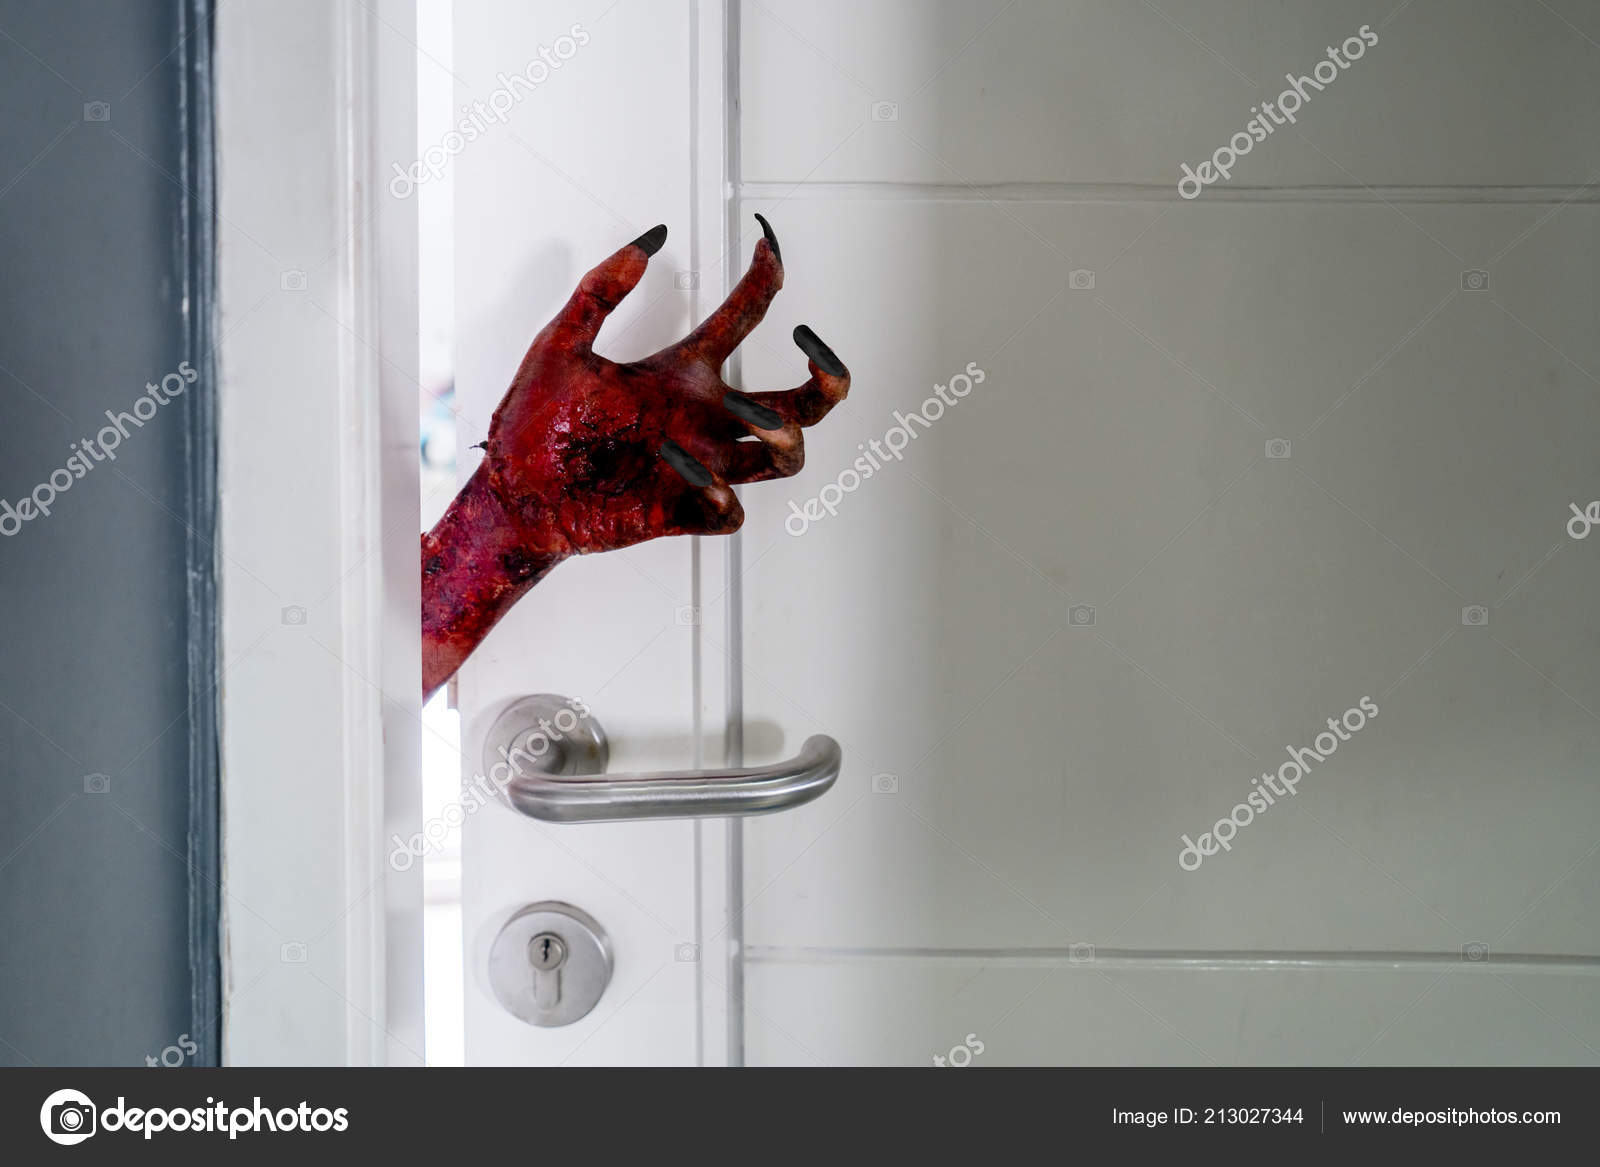 https://st4.depositphotos.com/1252160/21302/i/1600/depositphotos_213027344-stock-photo-closeup-scary-hand-emerging-open.jpg